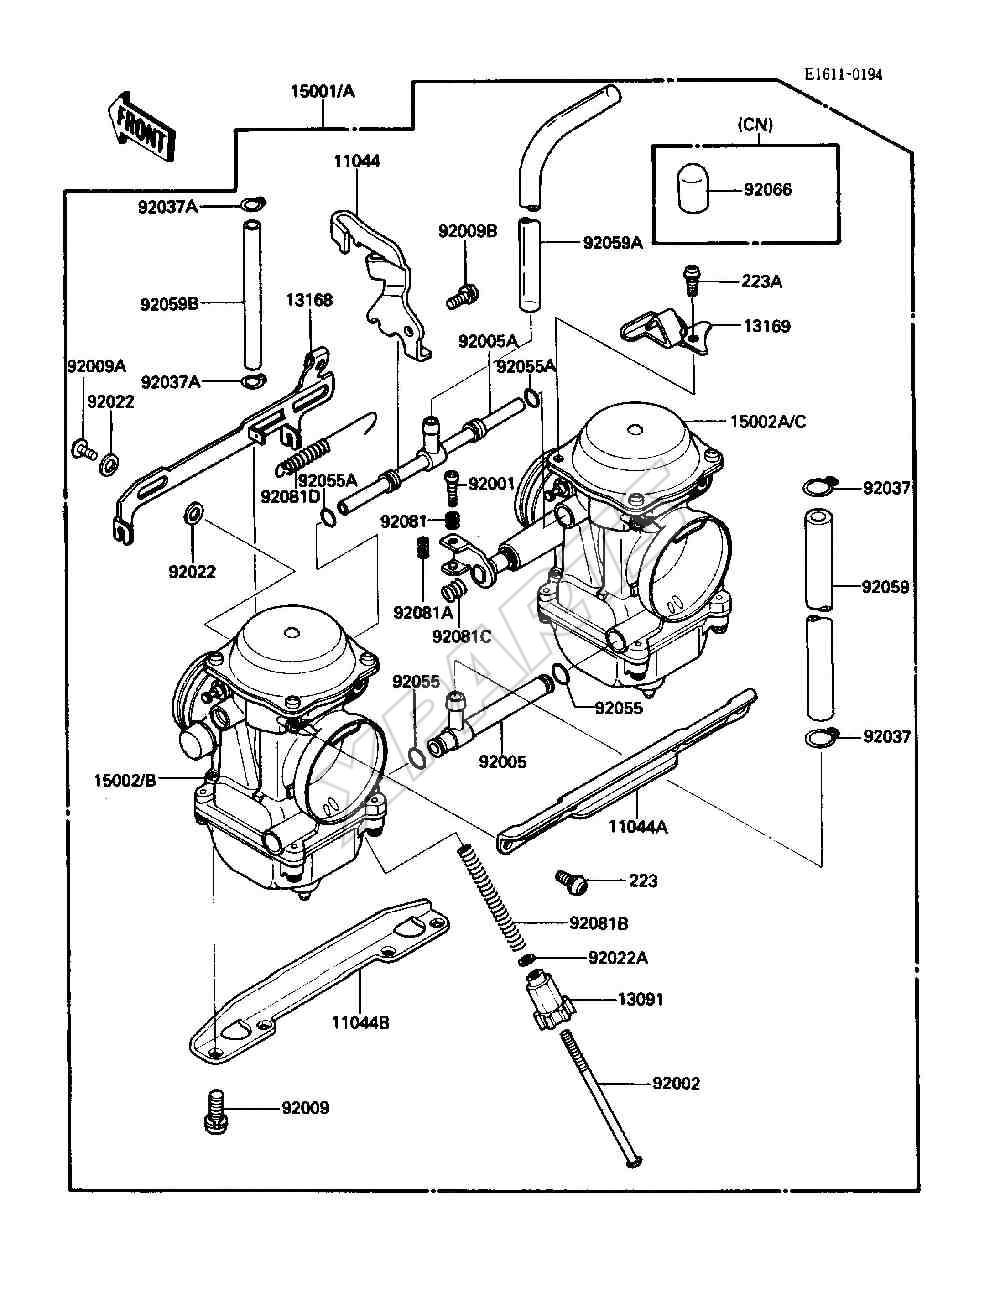 hight resolution of kawasaki 454 ltd en450 a4 fra 1988 originale reservedele fra 1987 454 kawasaki engine diagram